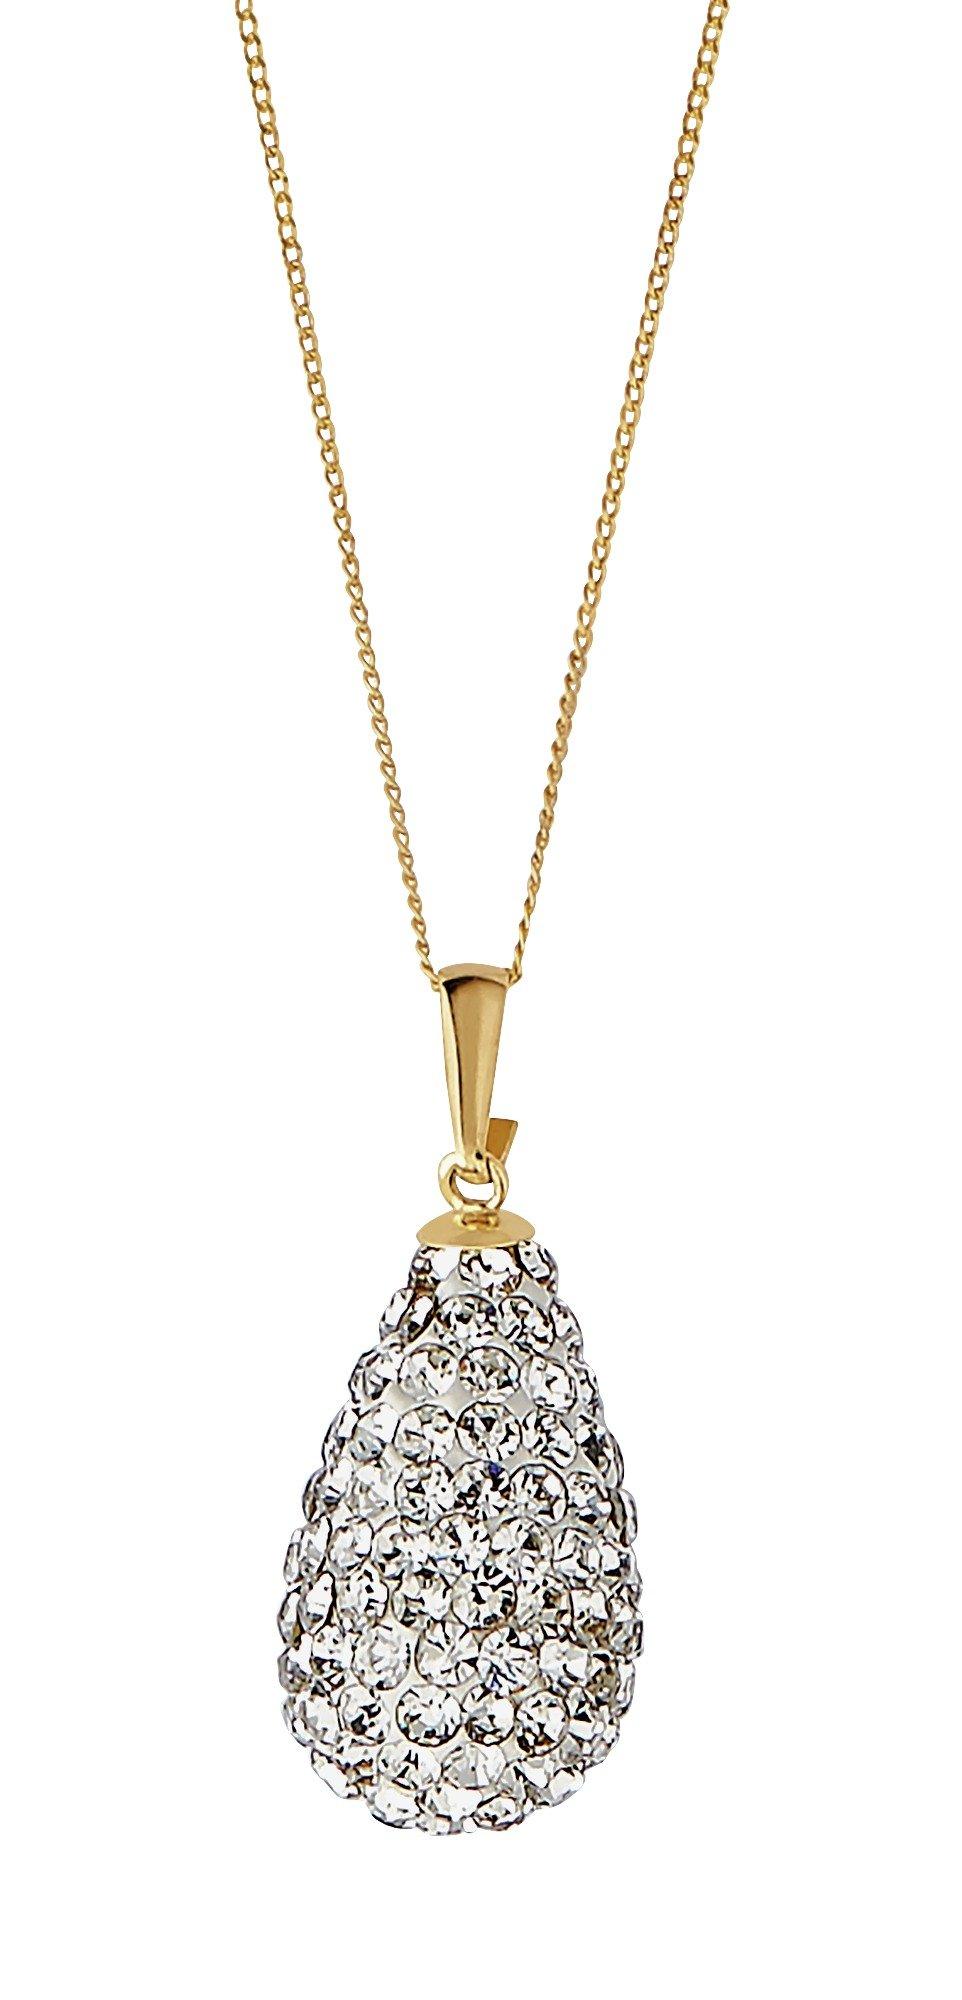 Revere 9ct Gold Crystal Drop Pendant